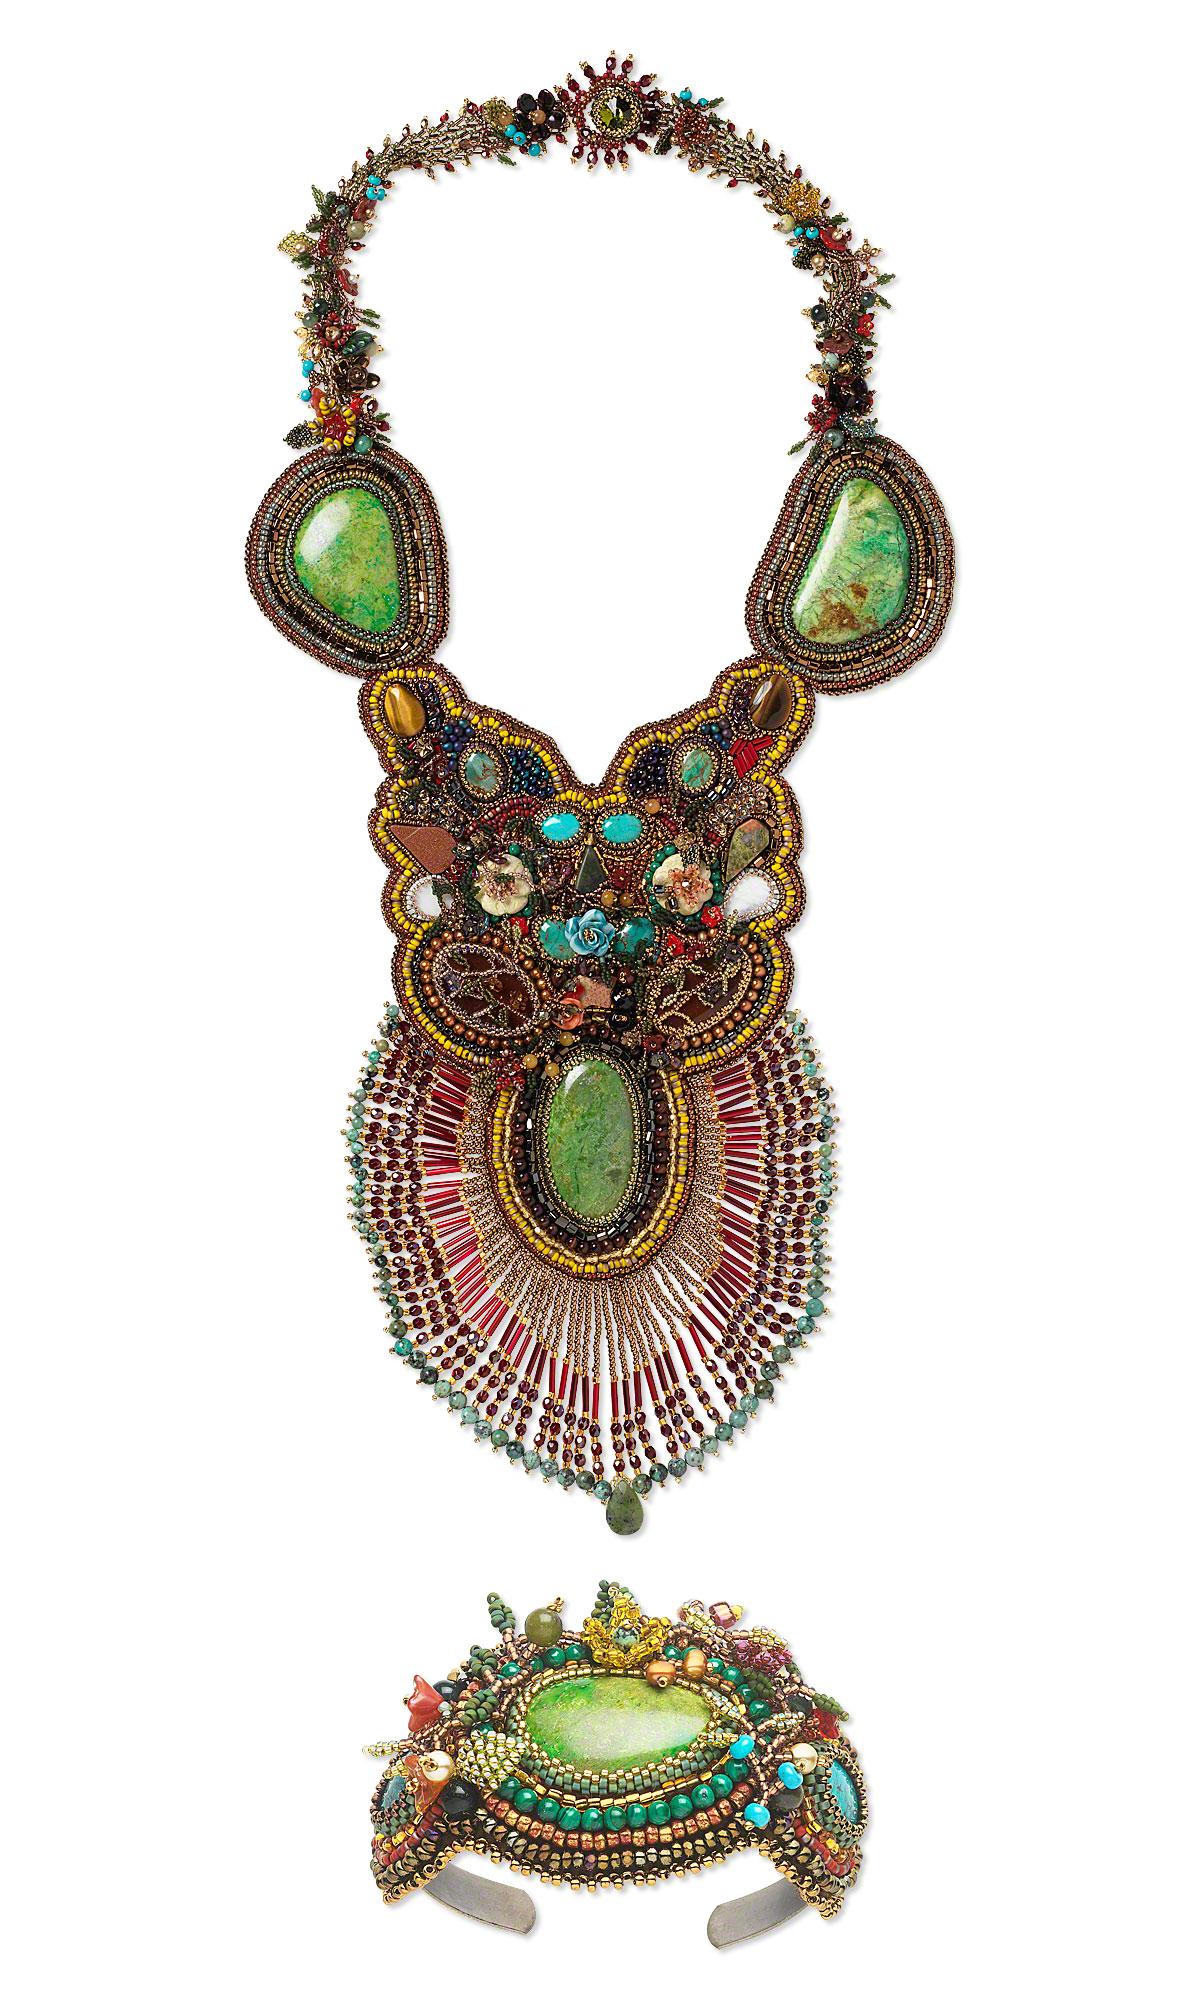 jewelry design bib style necklace and bracelet cuff set